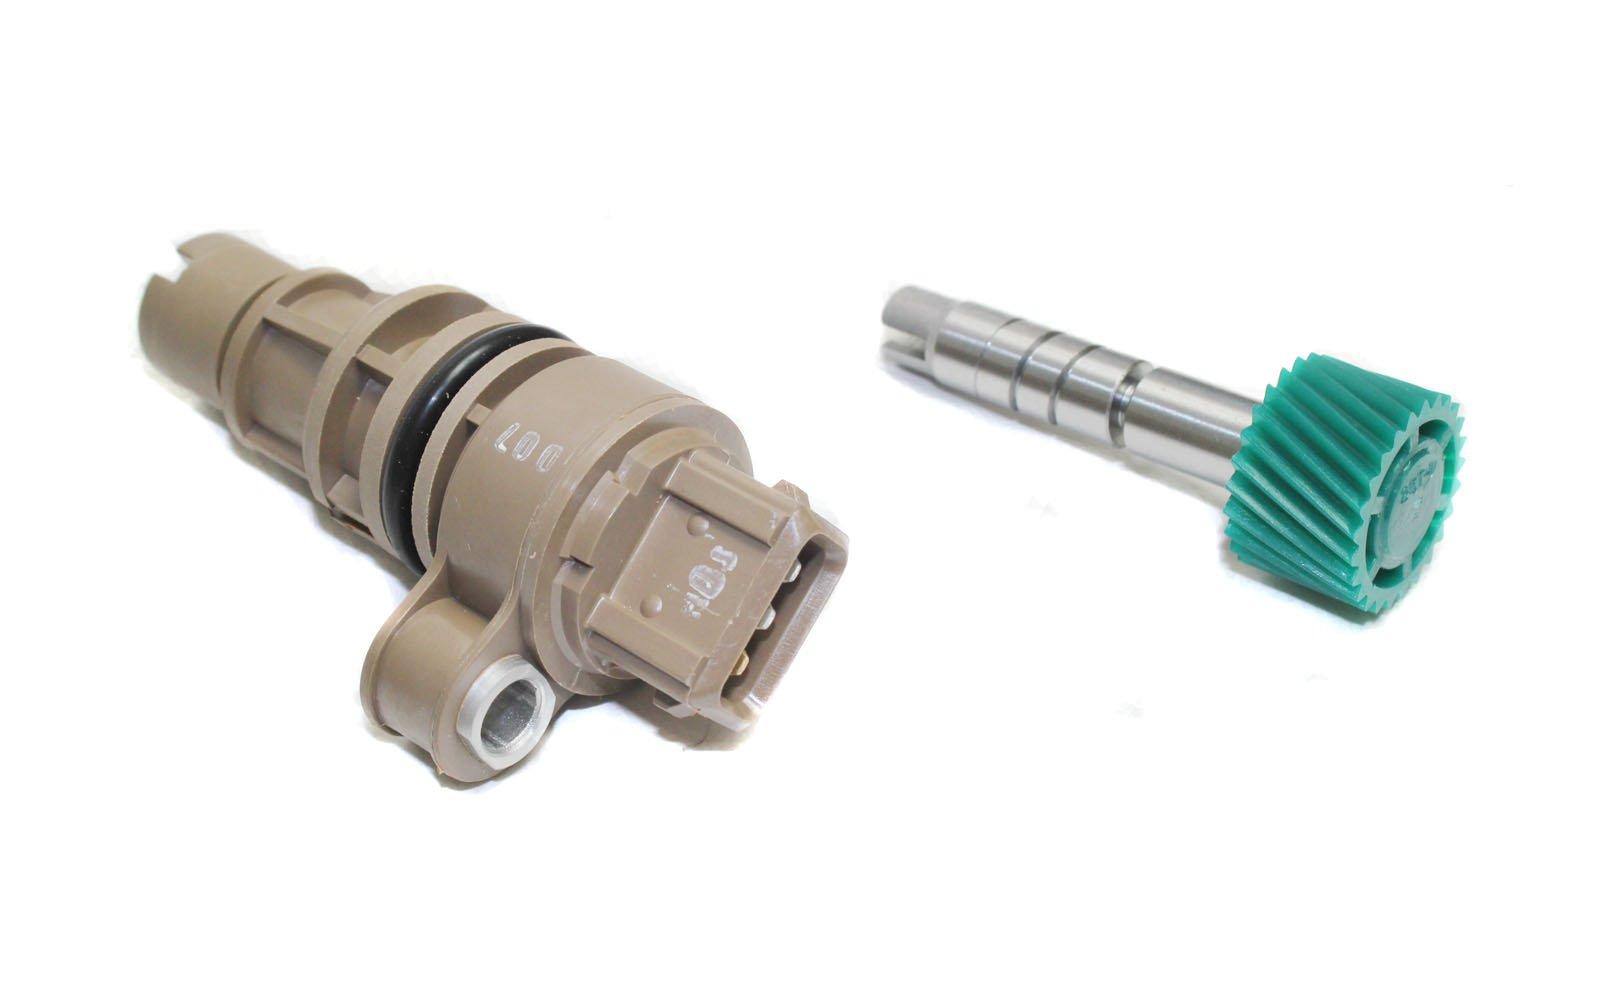 OEM Vehicle Speed Sensor+gear for Hyundai 01-06 Santa Fe